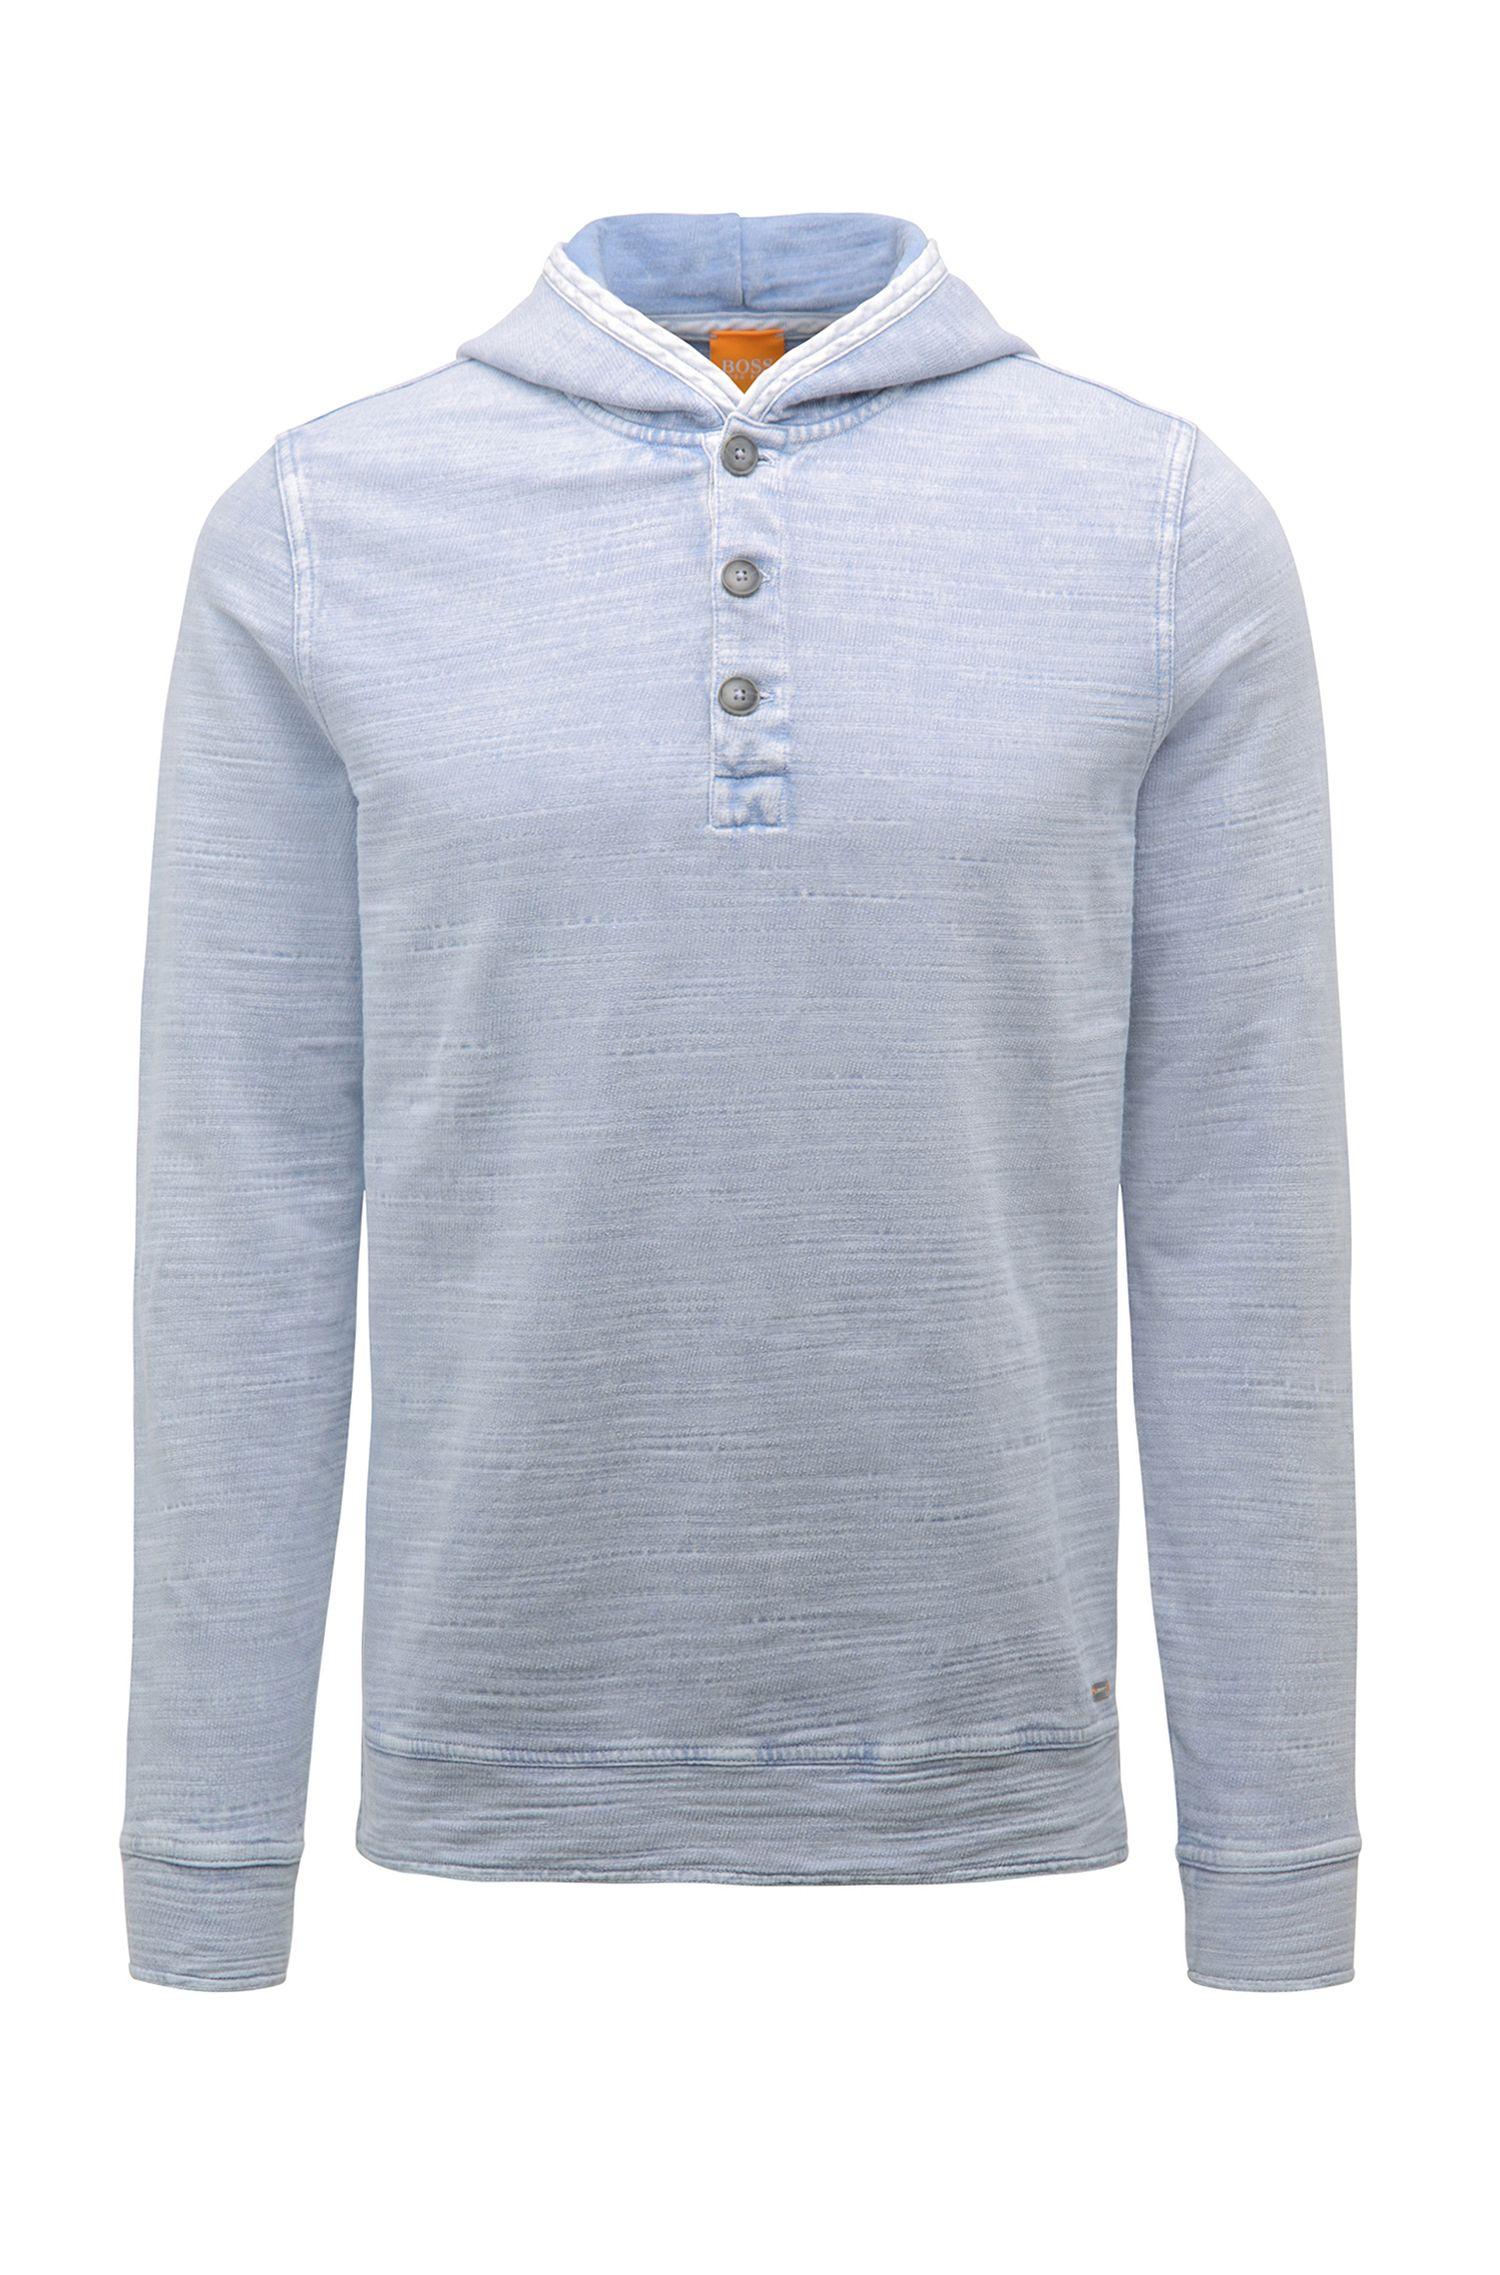 'Wizard' | Cotton Hooded Sweatshirt